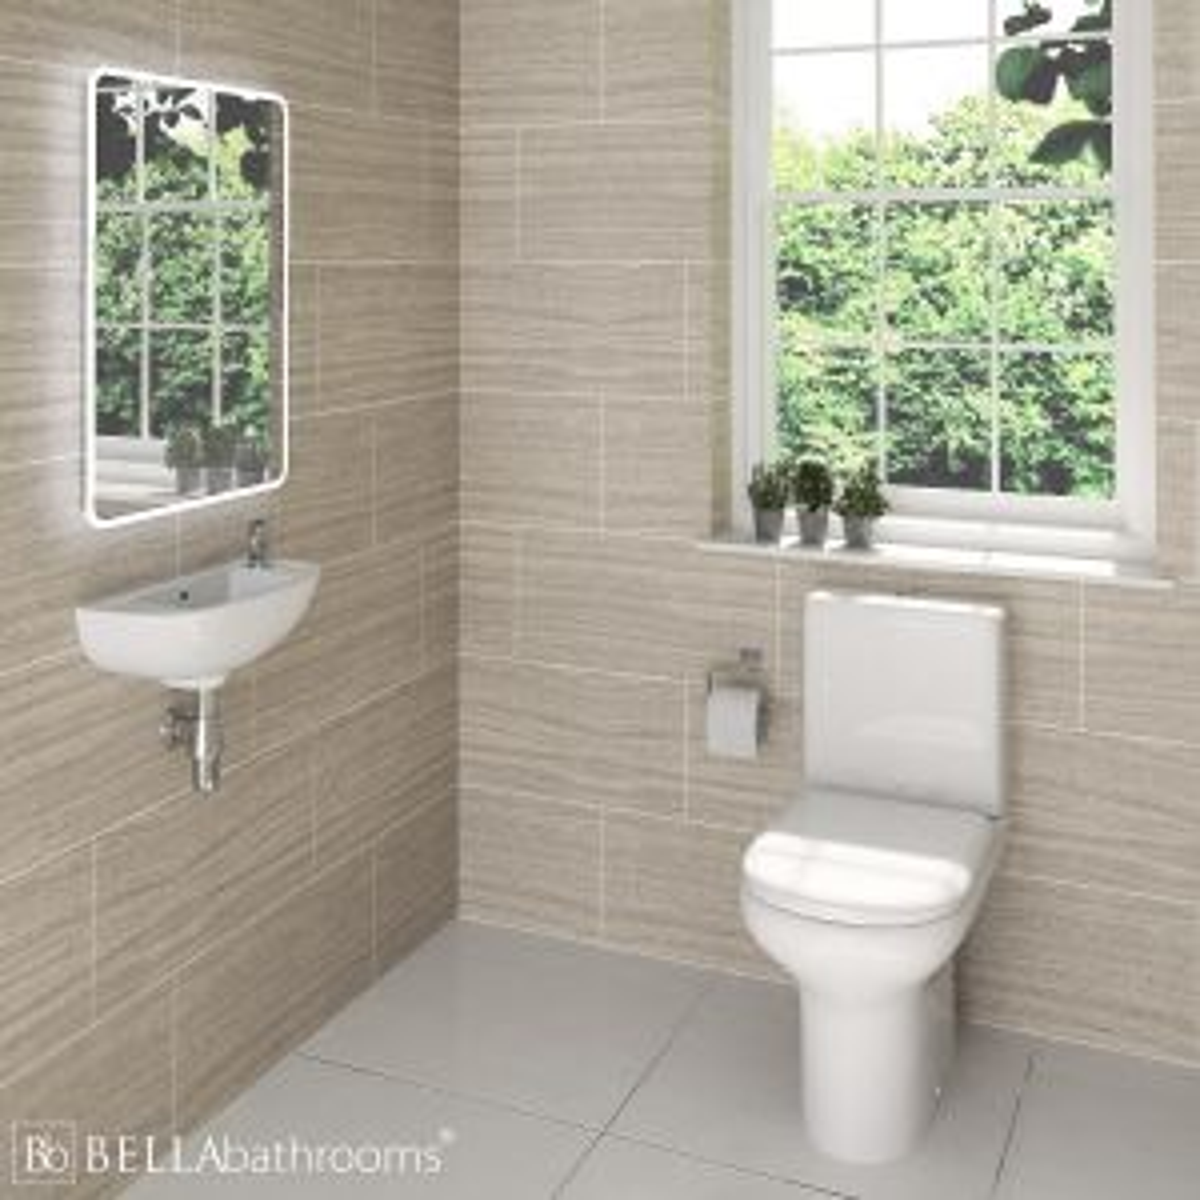 RAK Compact Cloakroom Suite with Slimline Basin